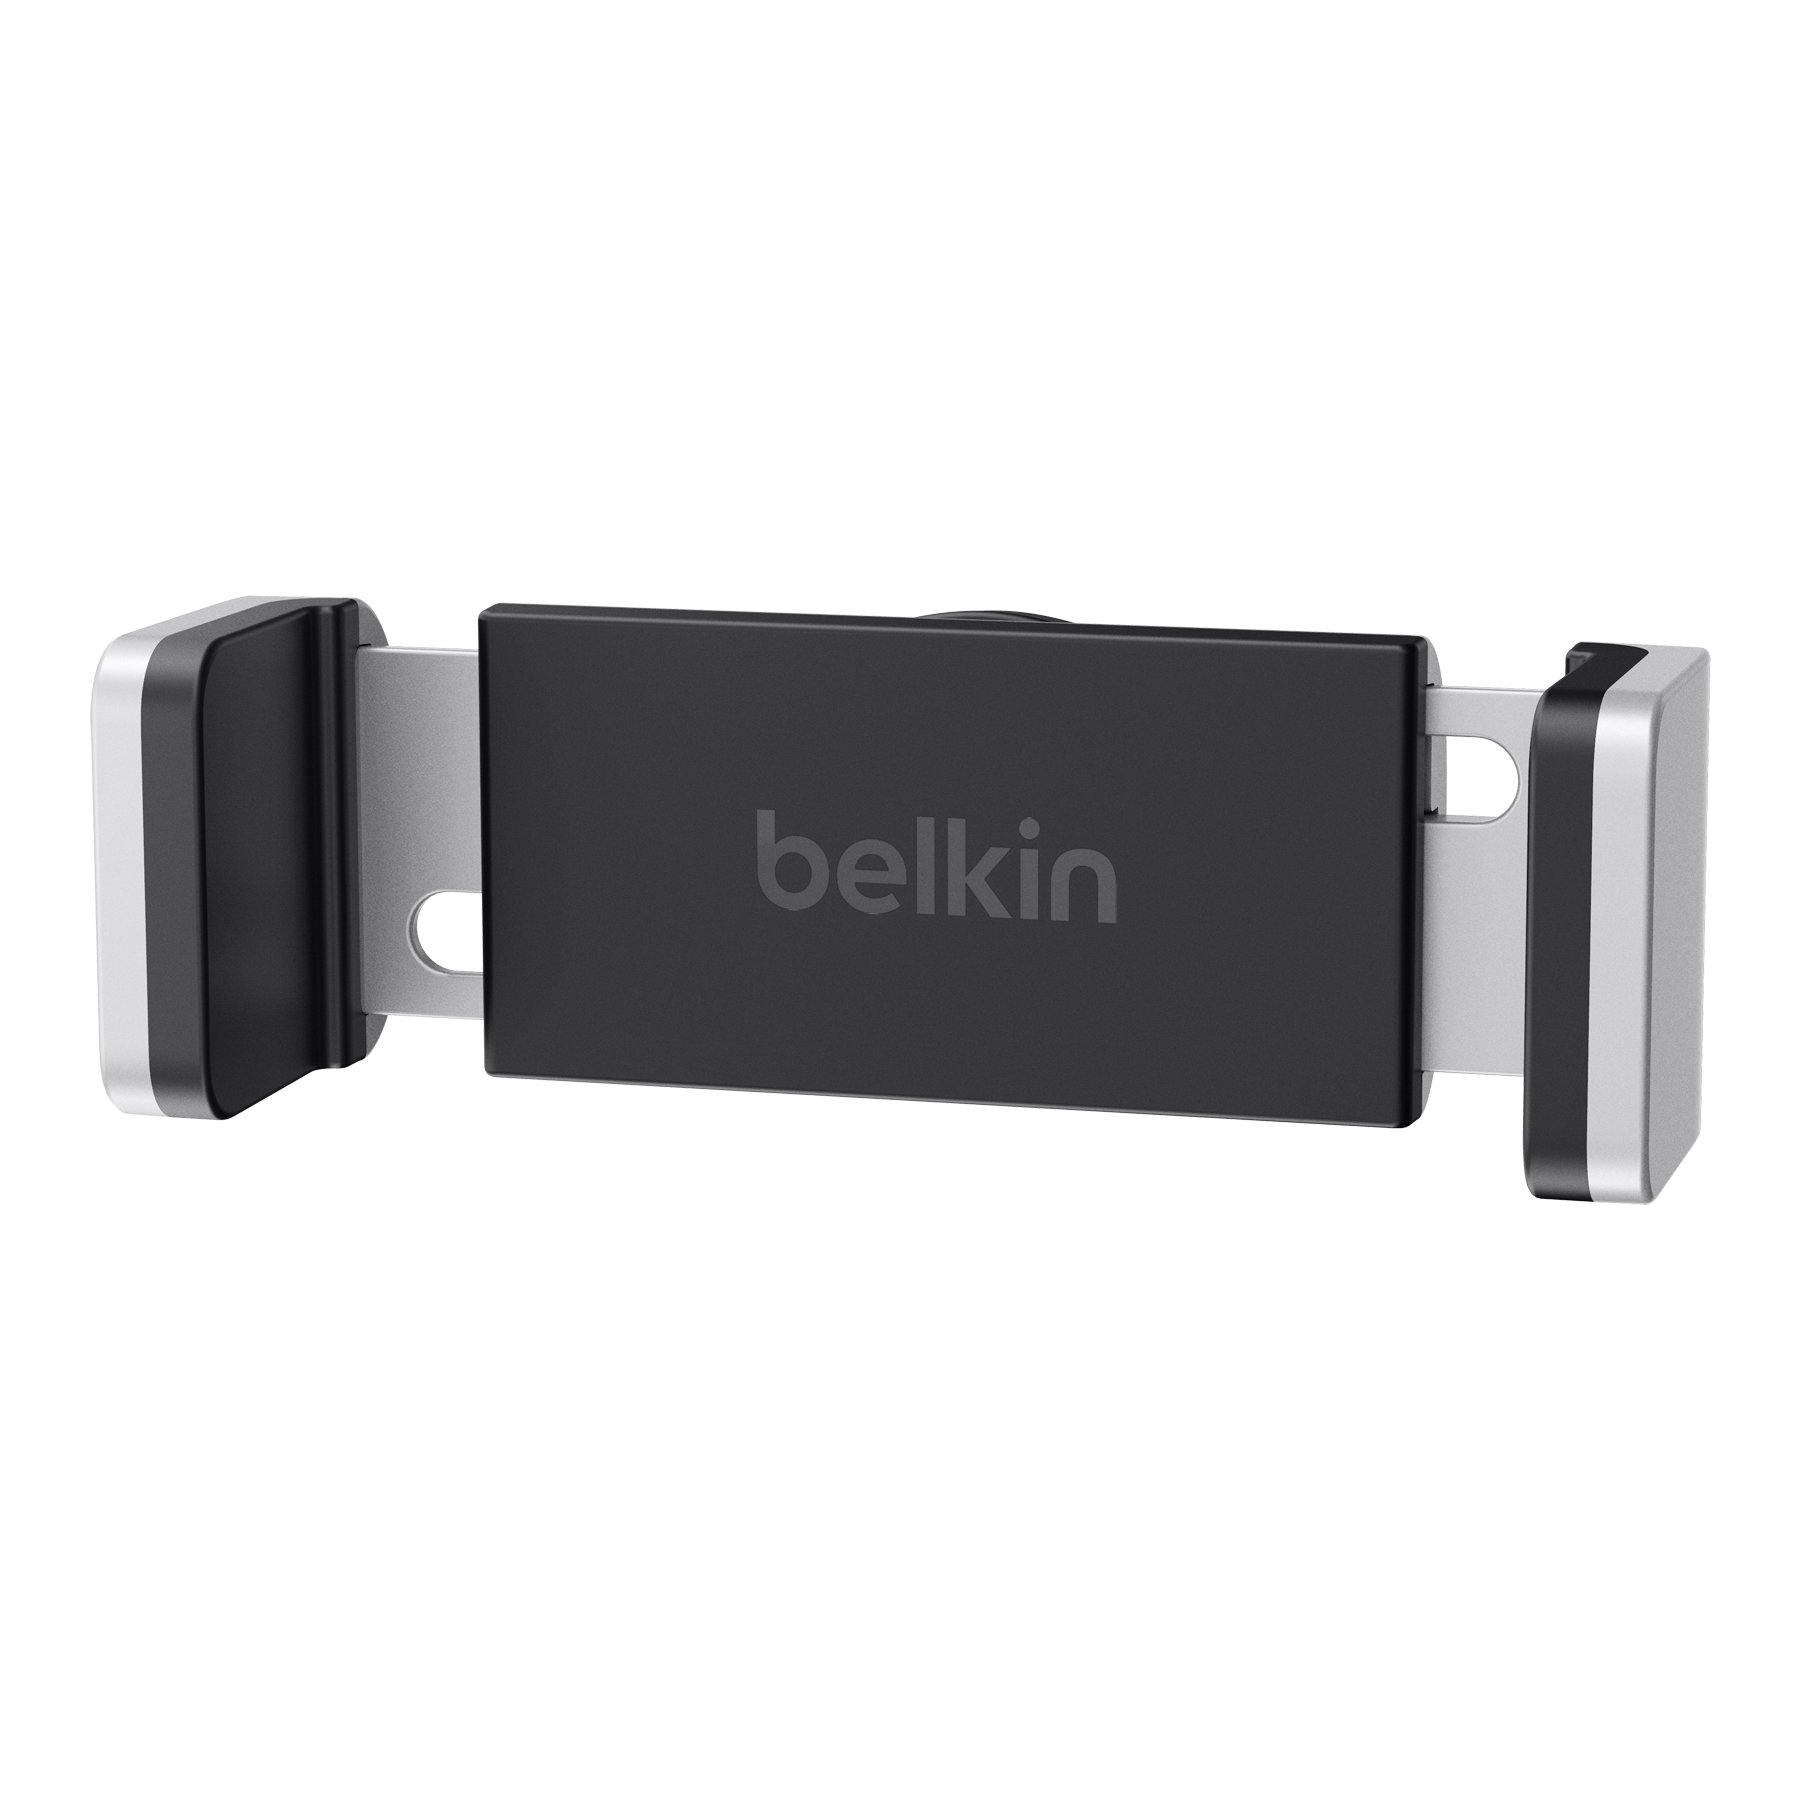 Belkin Car Vent Mount for Smartphones, Including All Samsung S Series and Apple iPhones (Older Model) by Belkin